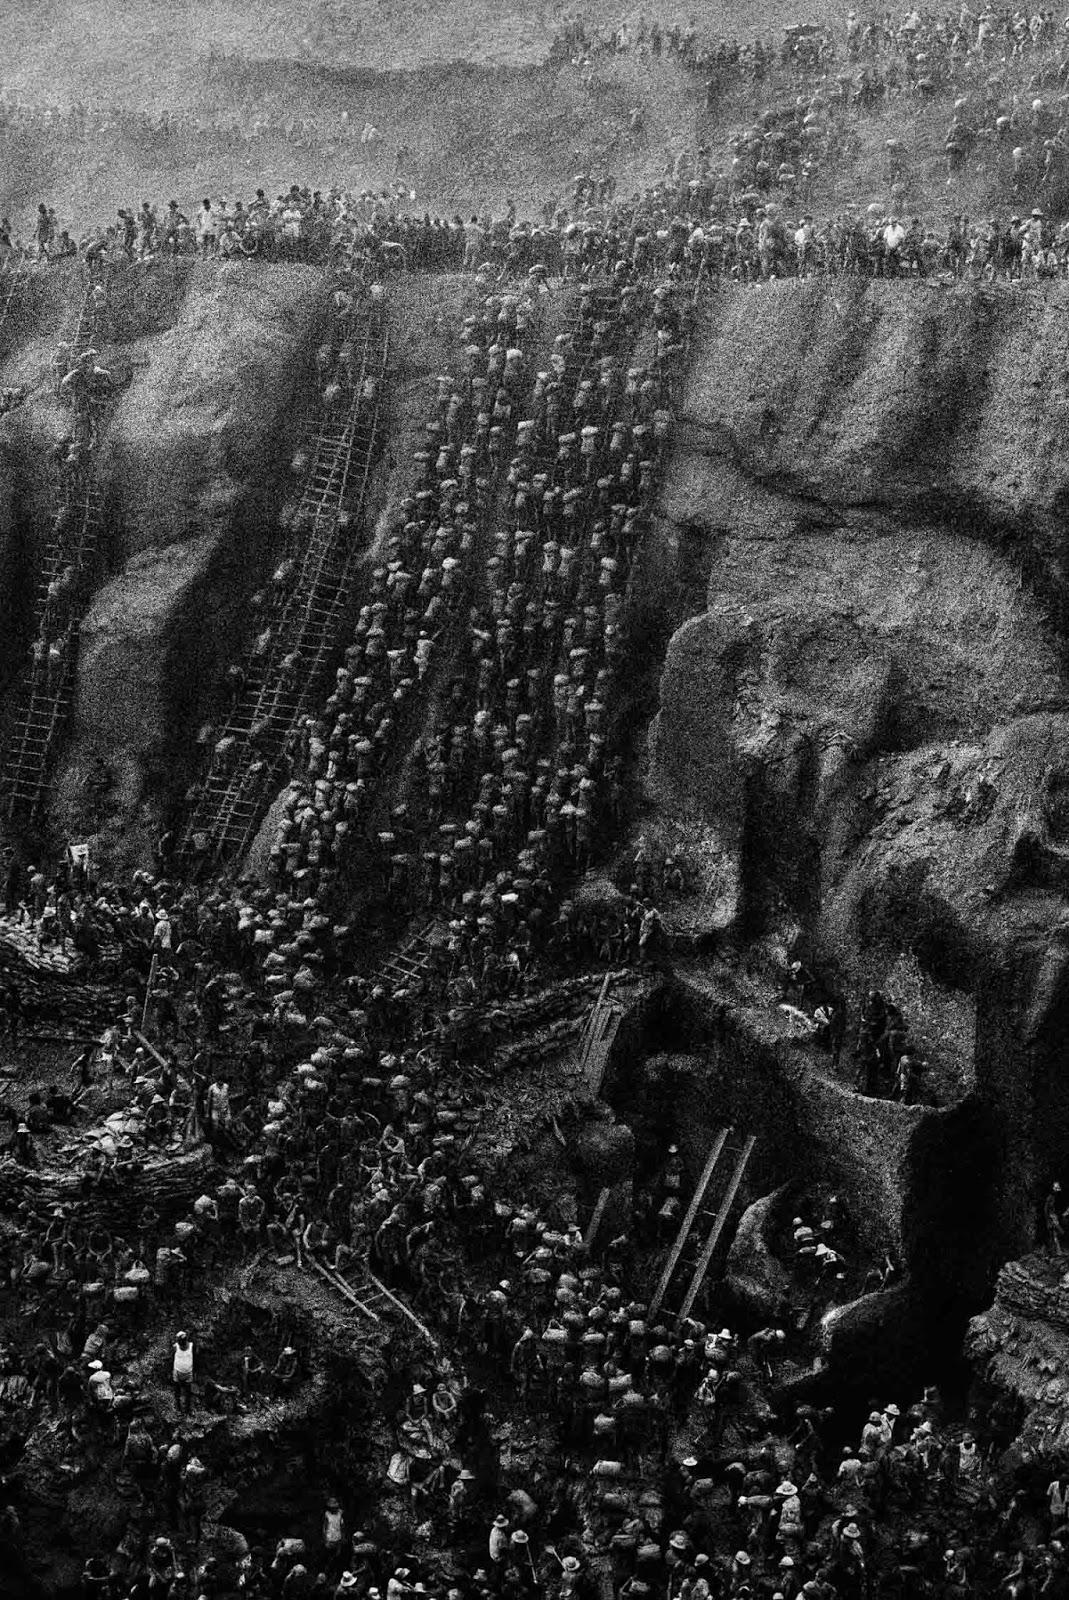 Durante o auge, a mina de Serra Pelada empregava cerca de 100.000 escavadores.